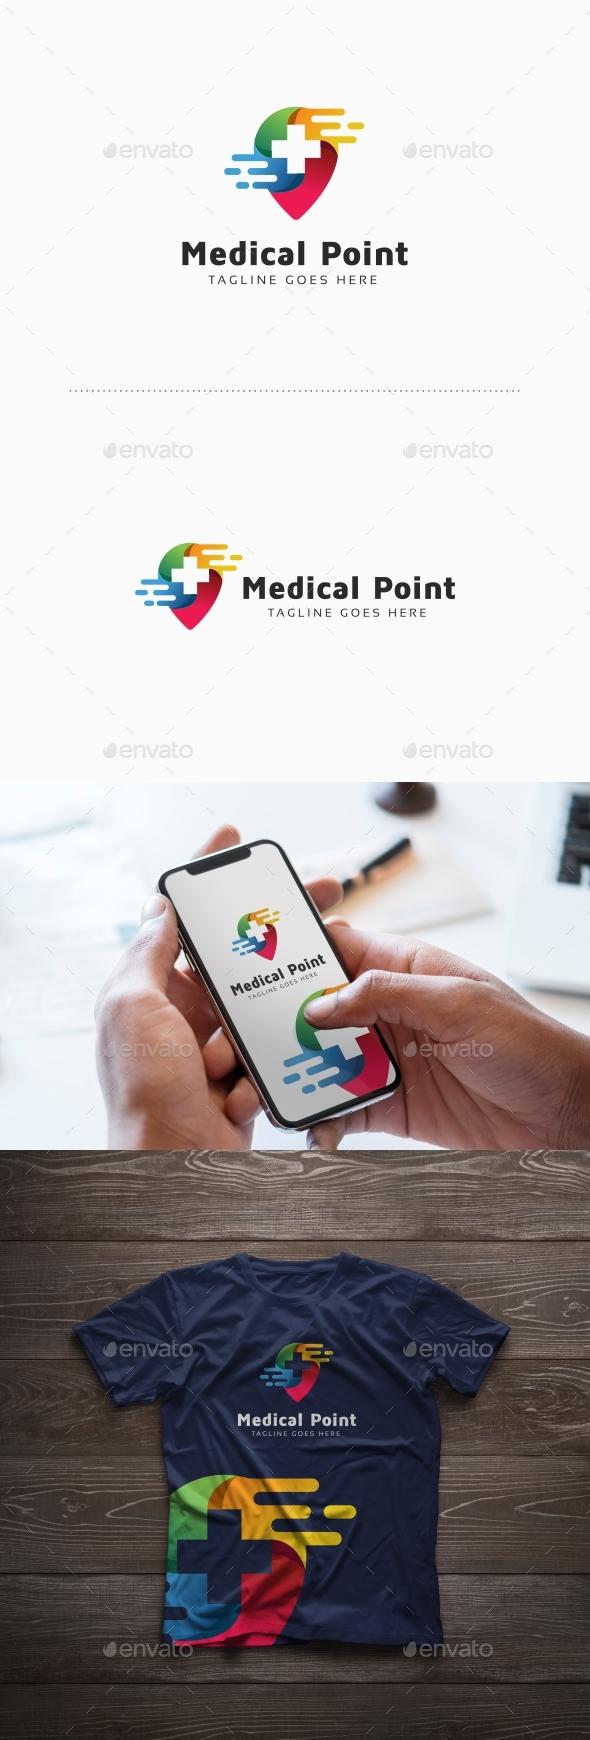 Medical Point Logo